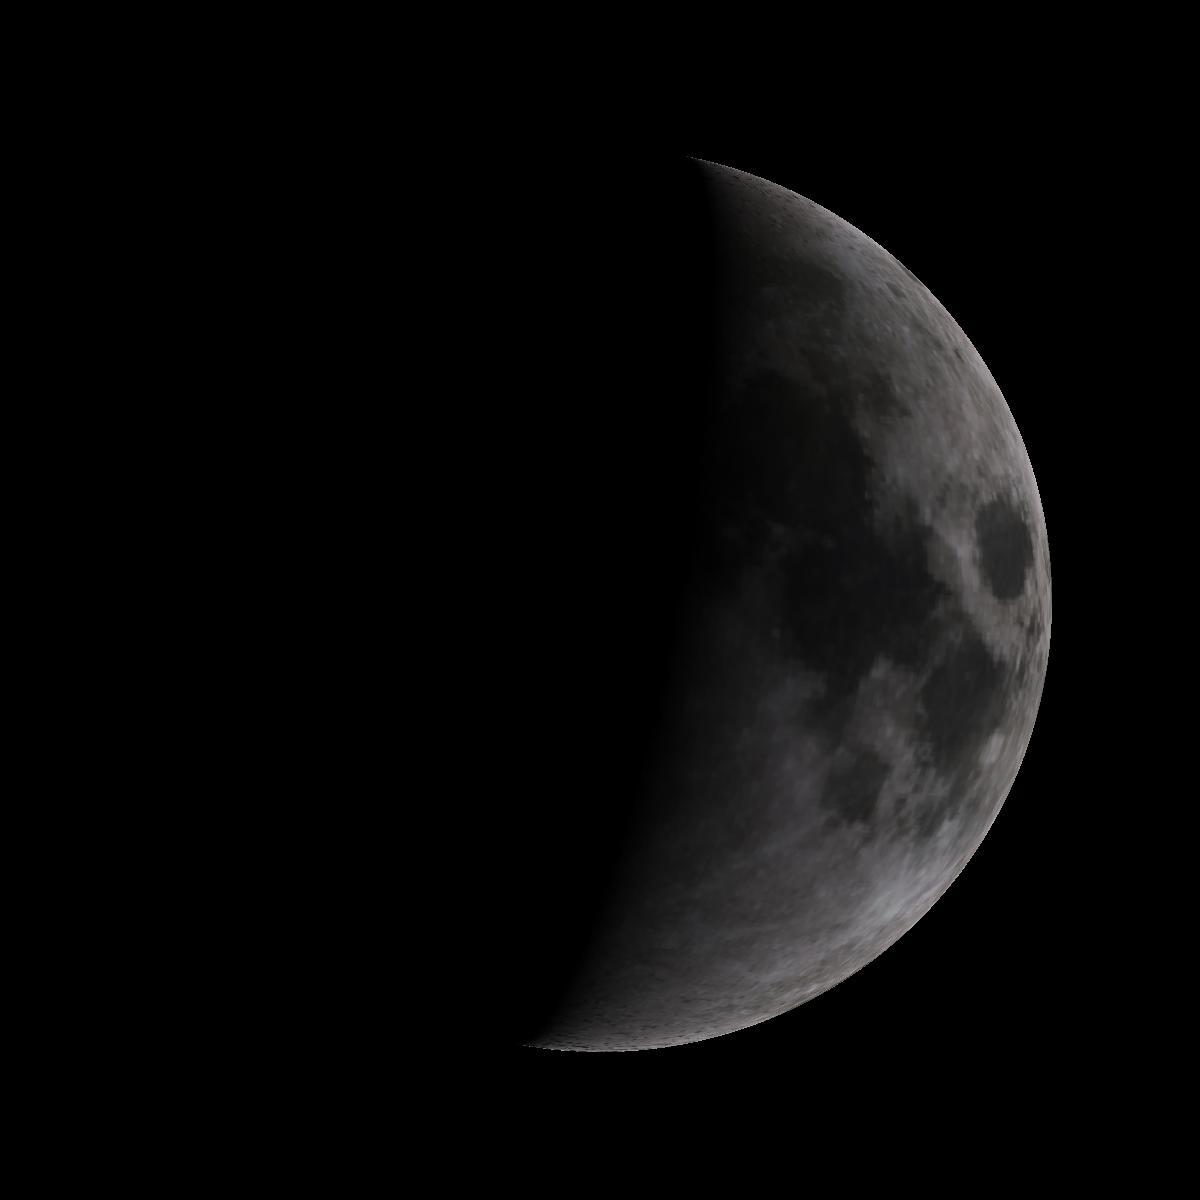 Lune du 2 mars 2020